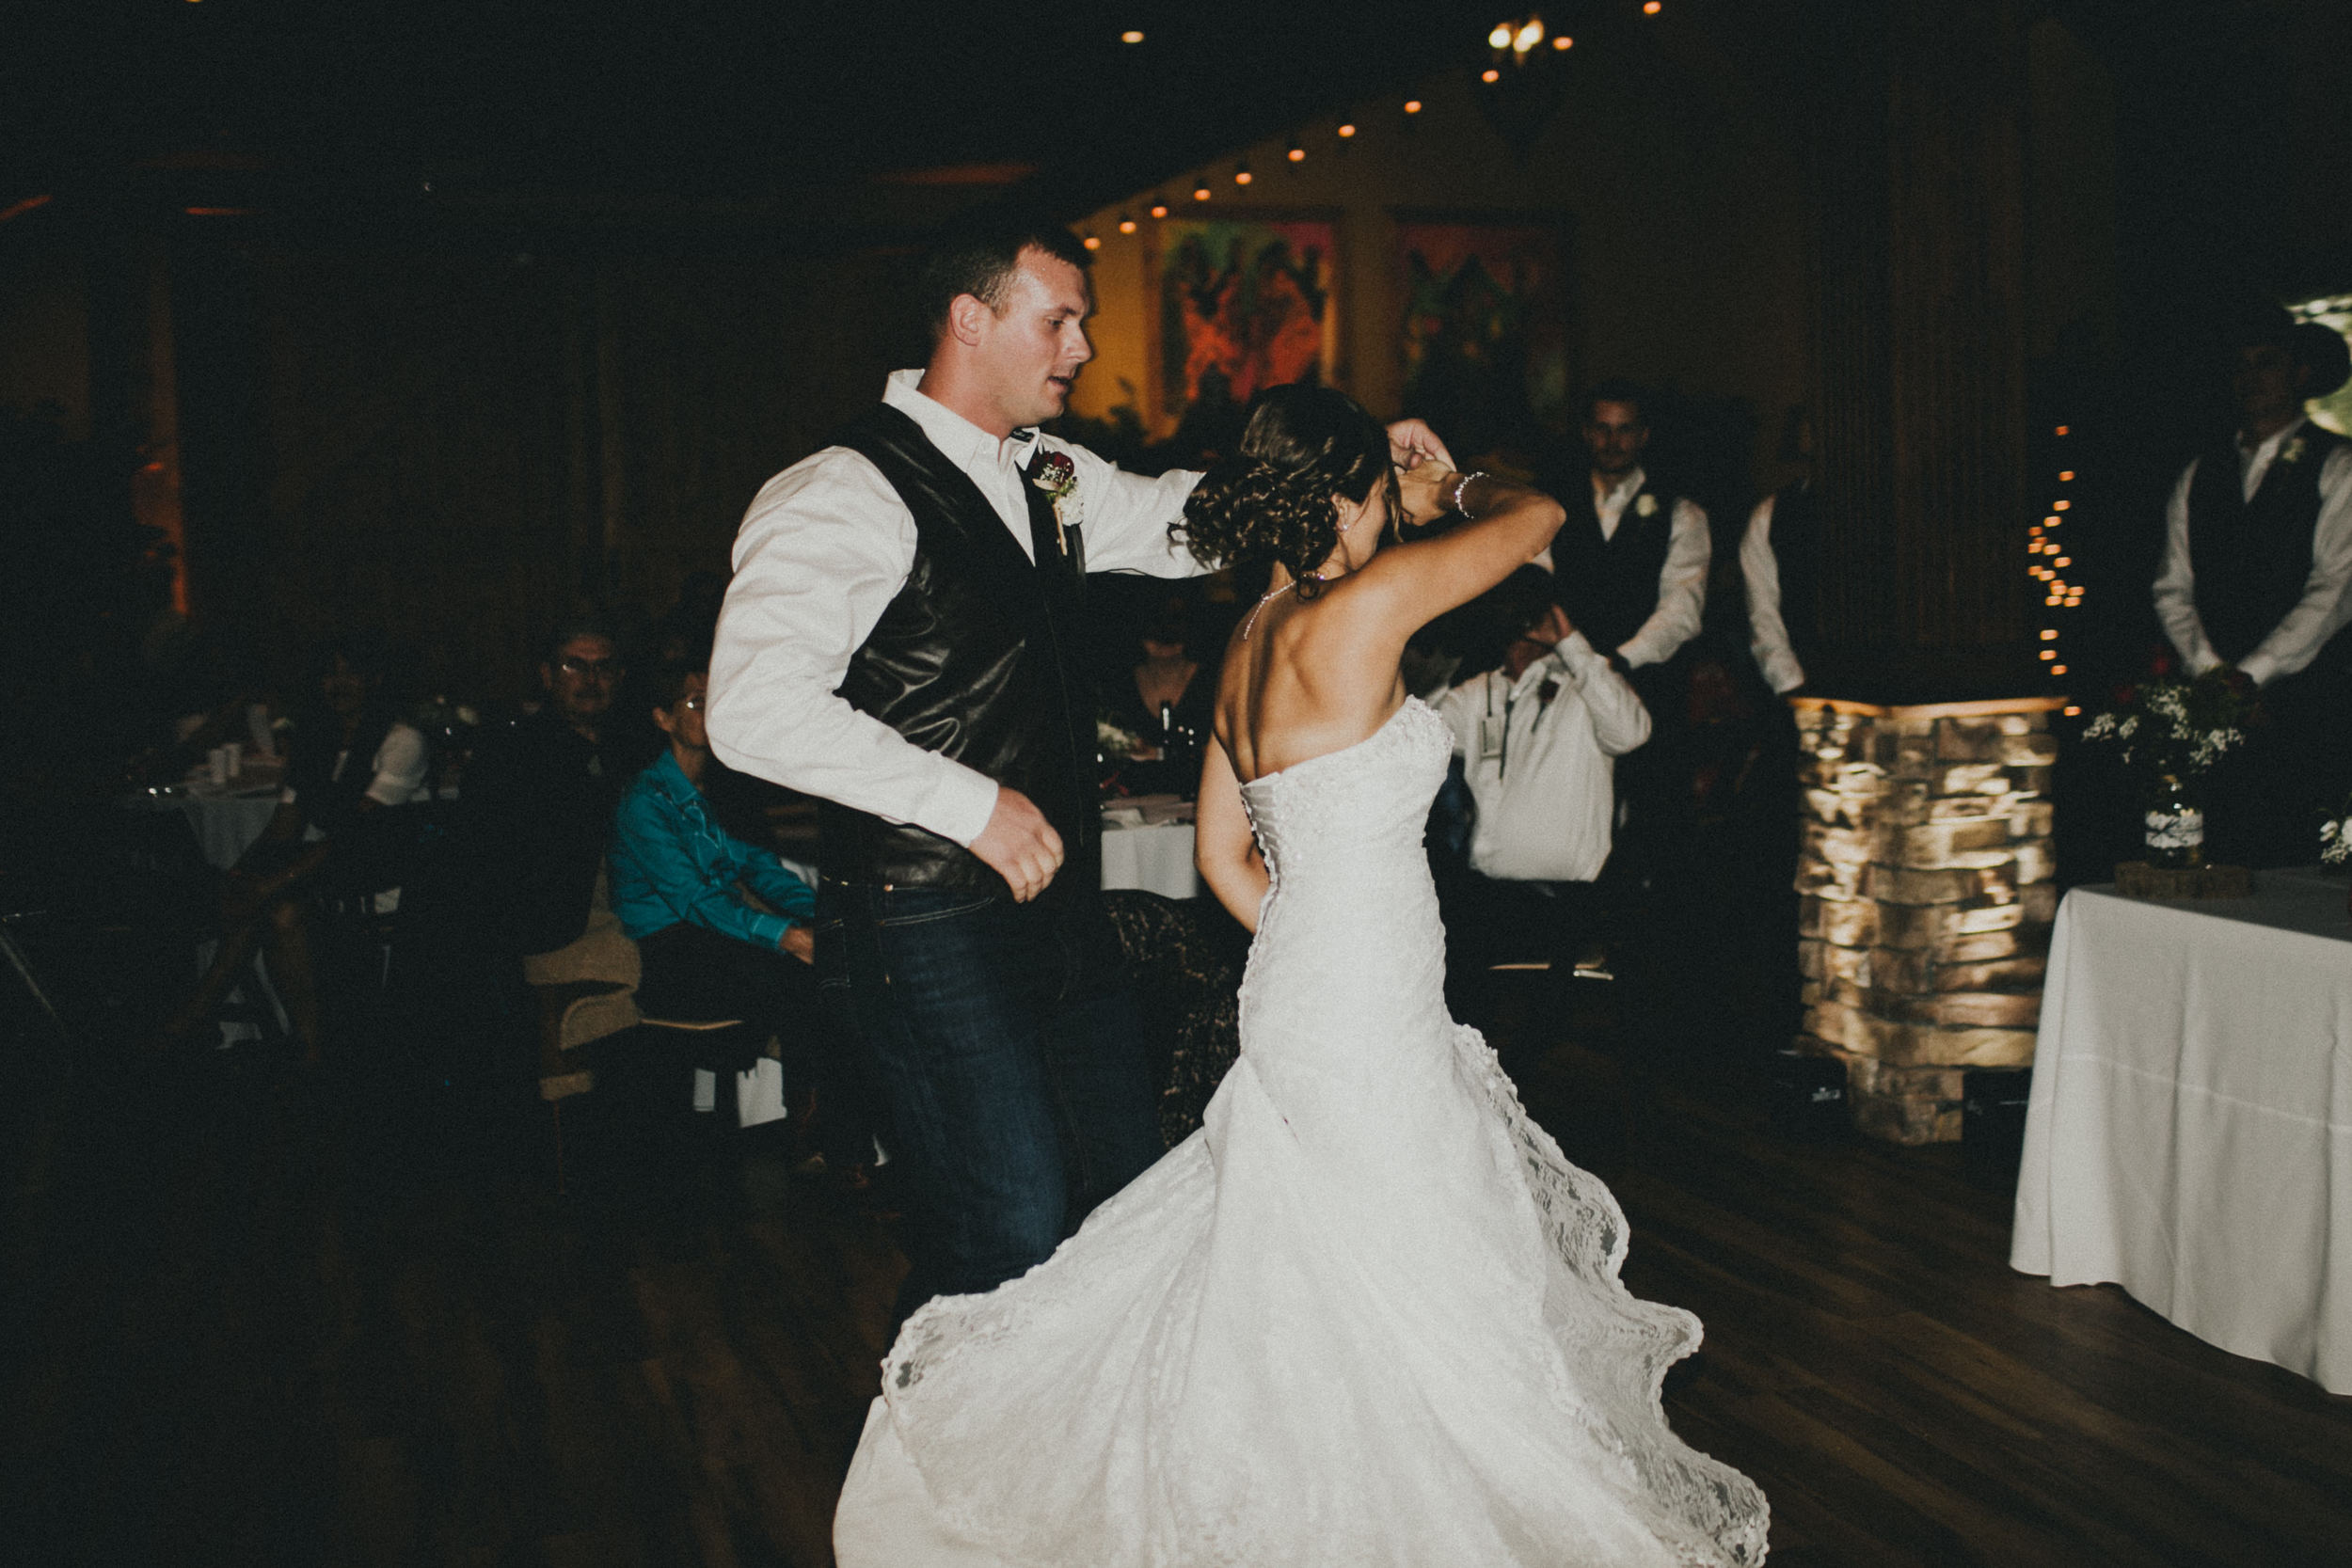 Cheyenne + Jordan - Wedding, Natalie Griffo (98 of 157).jpg